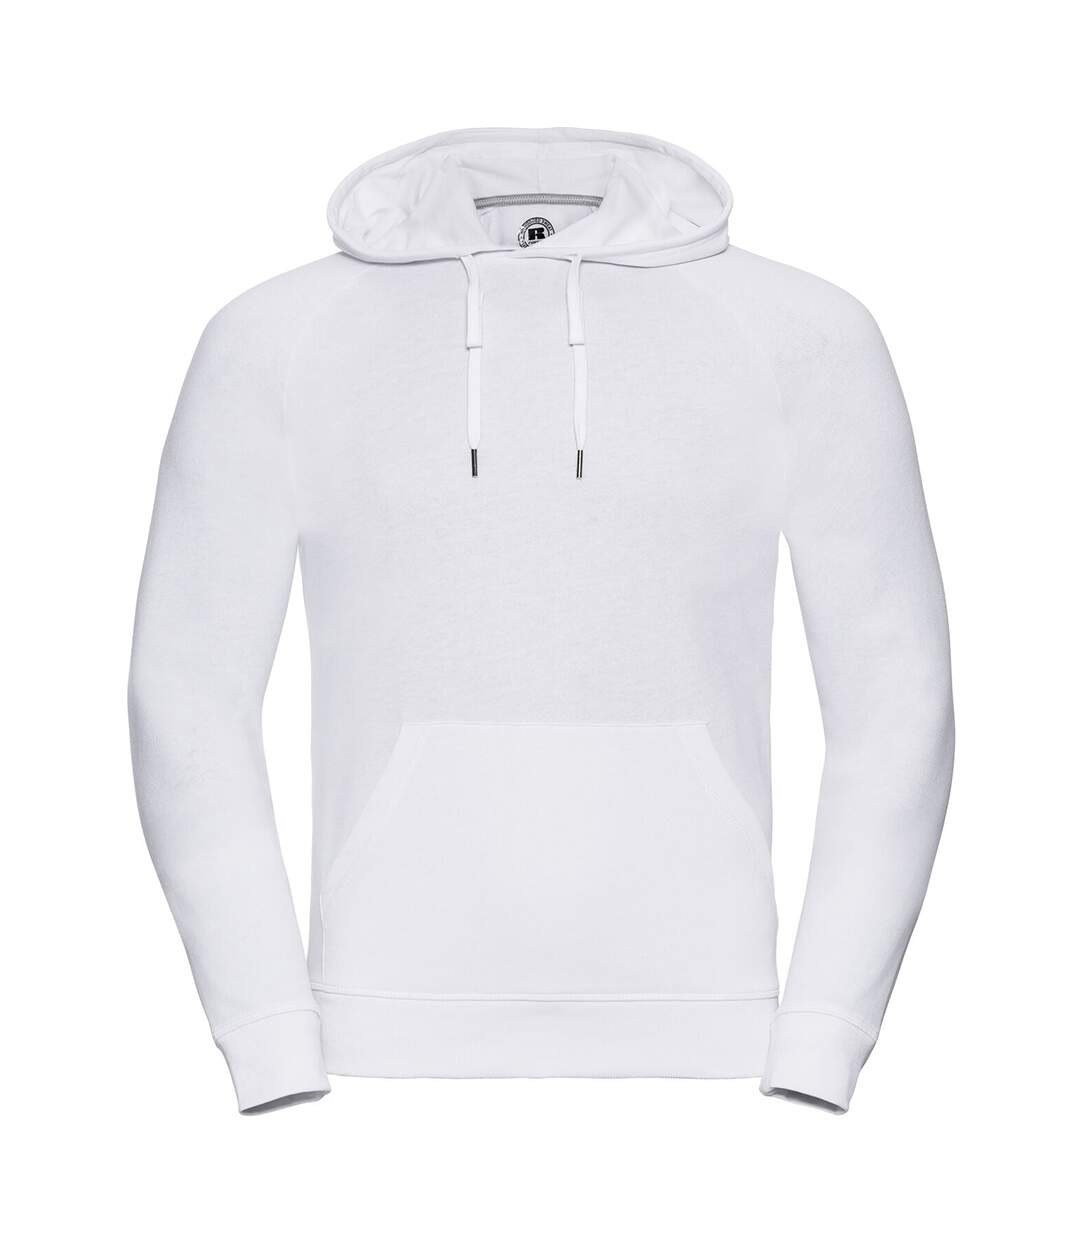 Russell Hd - Sweat À Capuche - Homme (Blanc) - UTRW5504